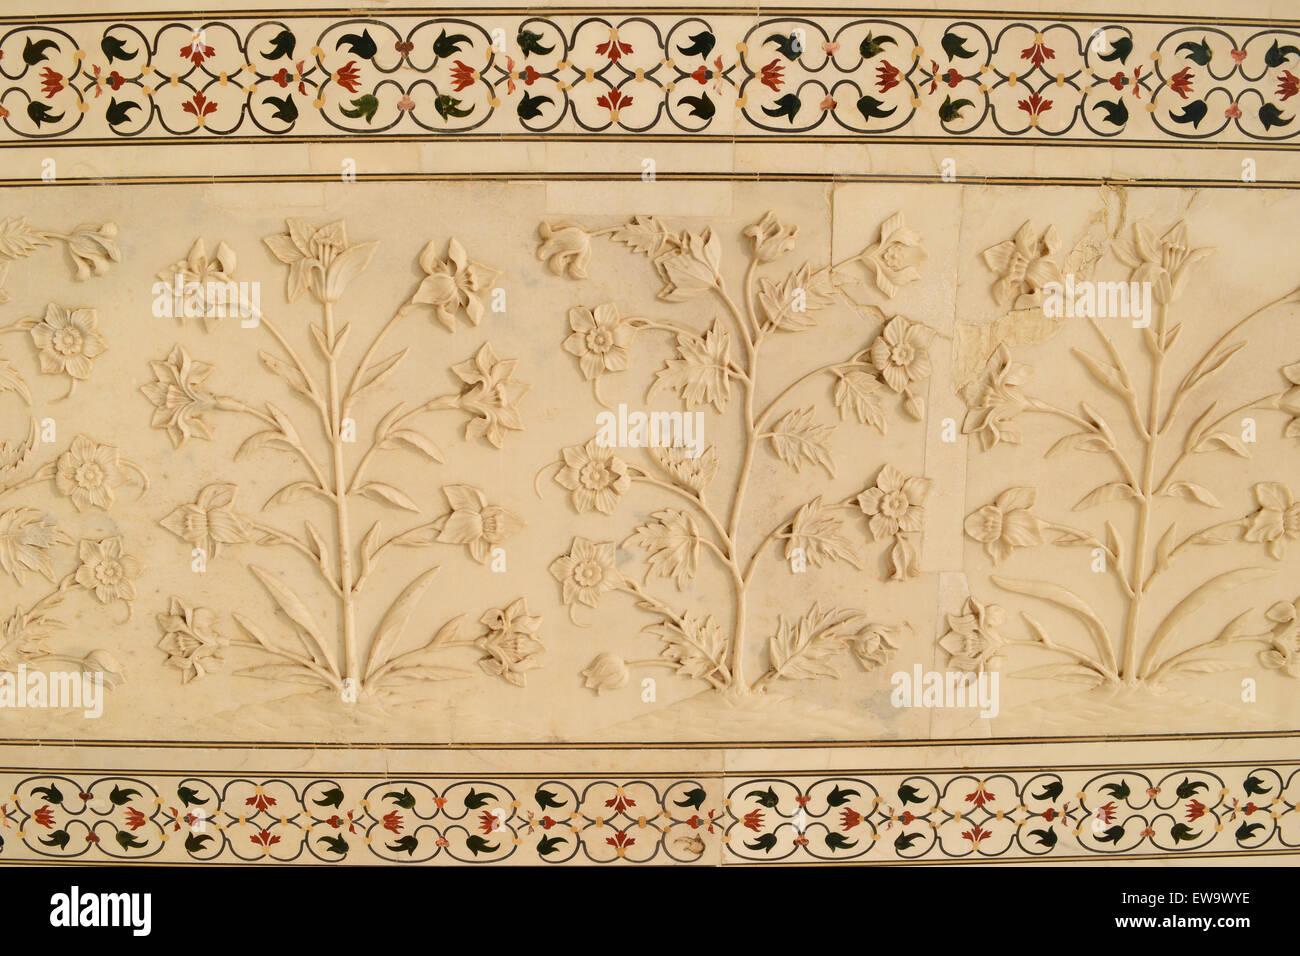 Taj mahal marmo arte fiori piante carving sul taj mahal piastrelle